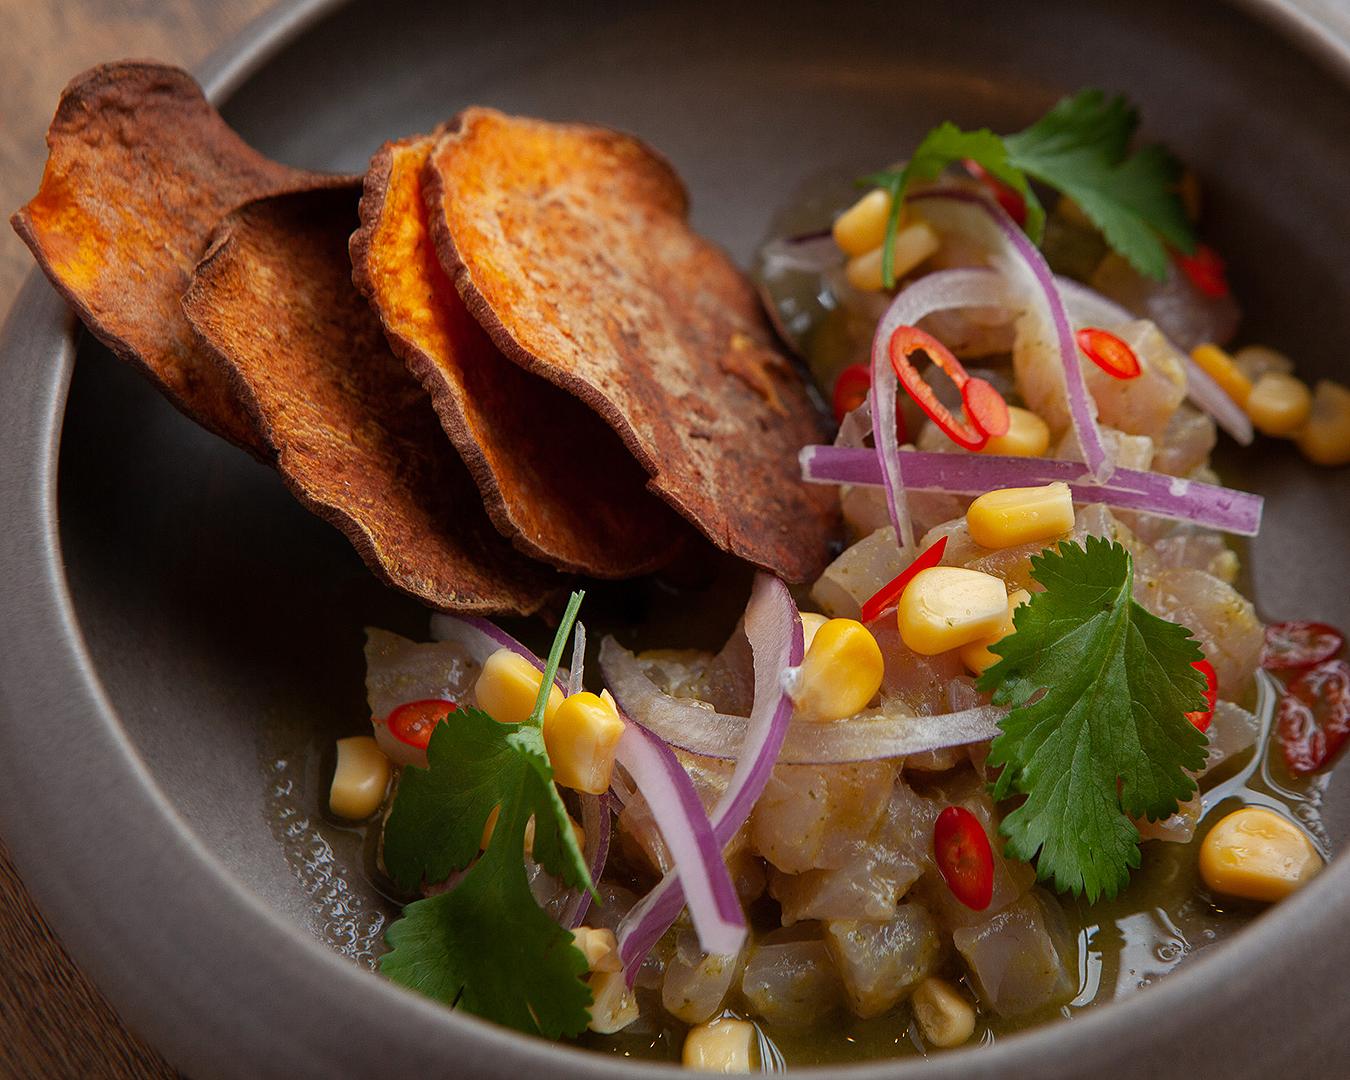 Yummy food at Inca